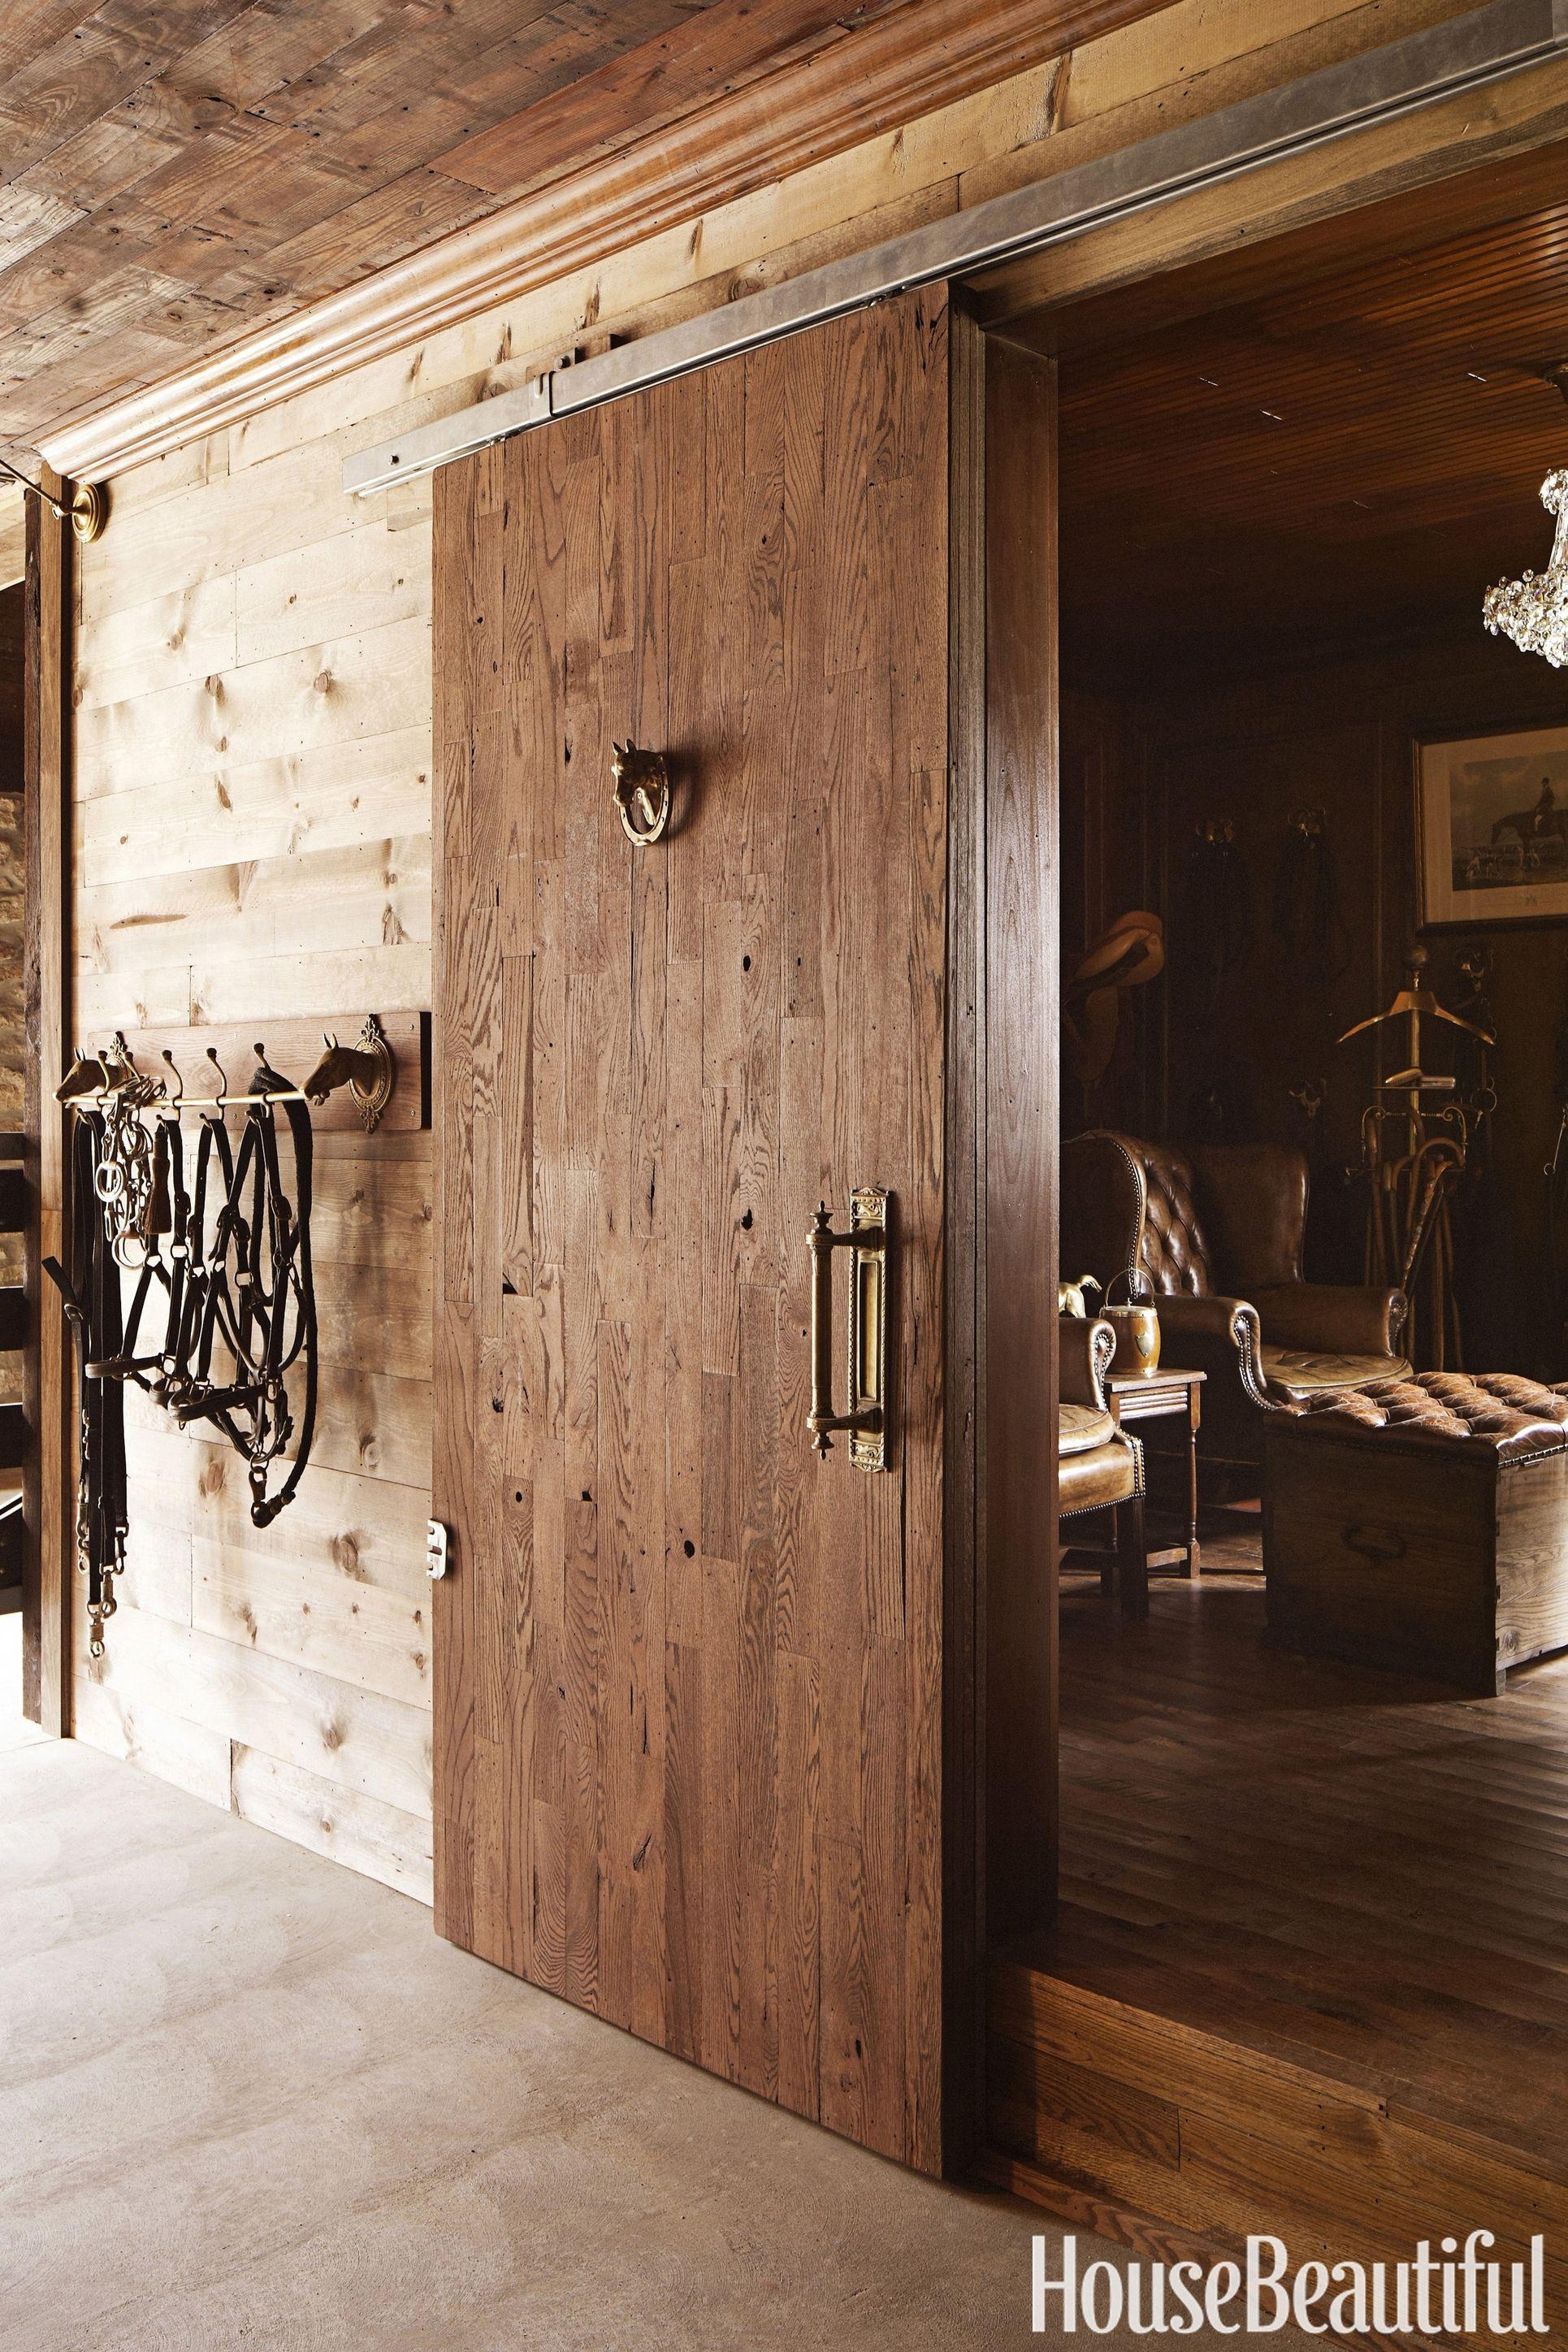 annie-brahler-smith-tack-room-door-0617.jpg